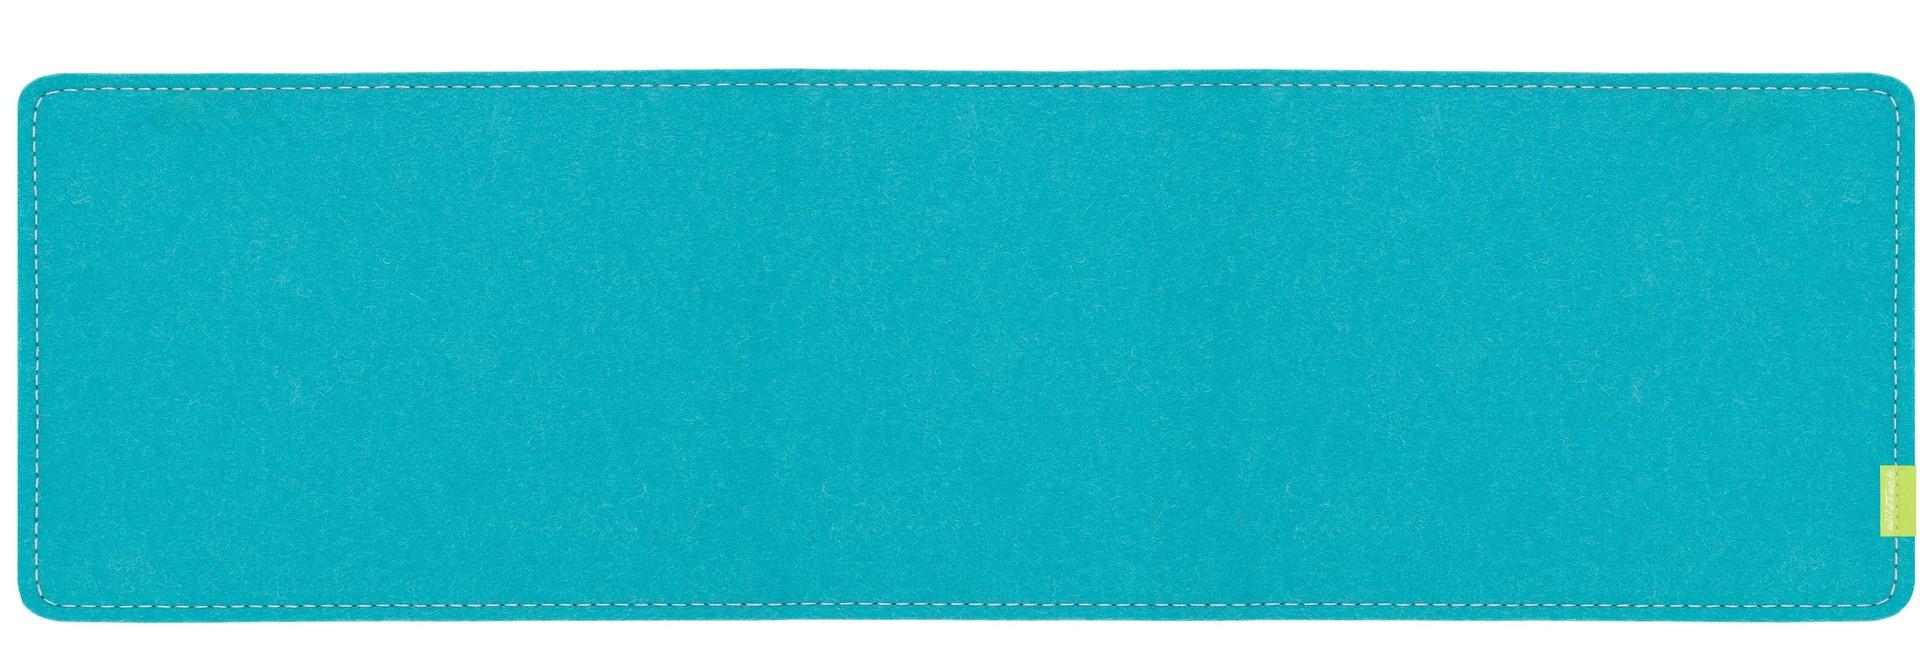 Underlay Turquoise